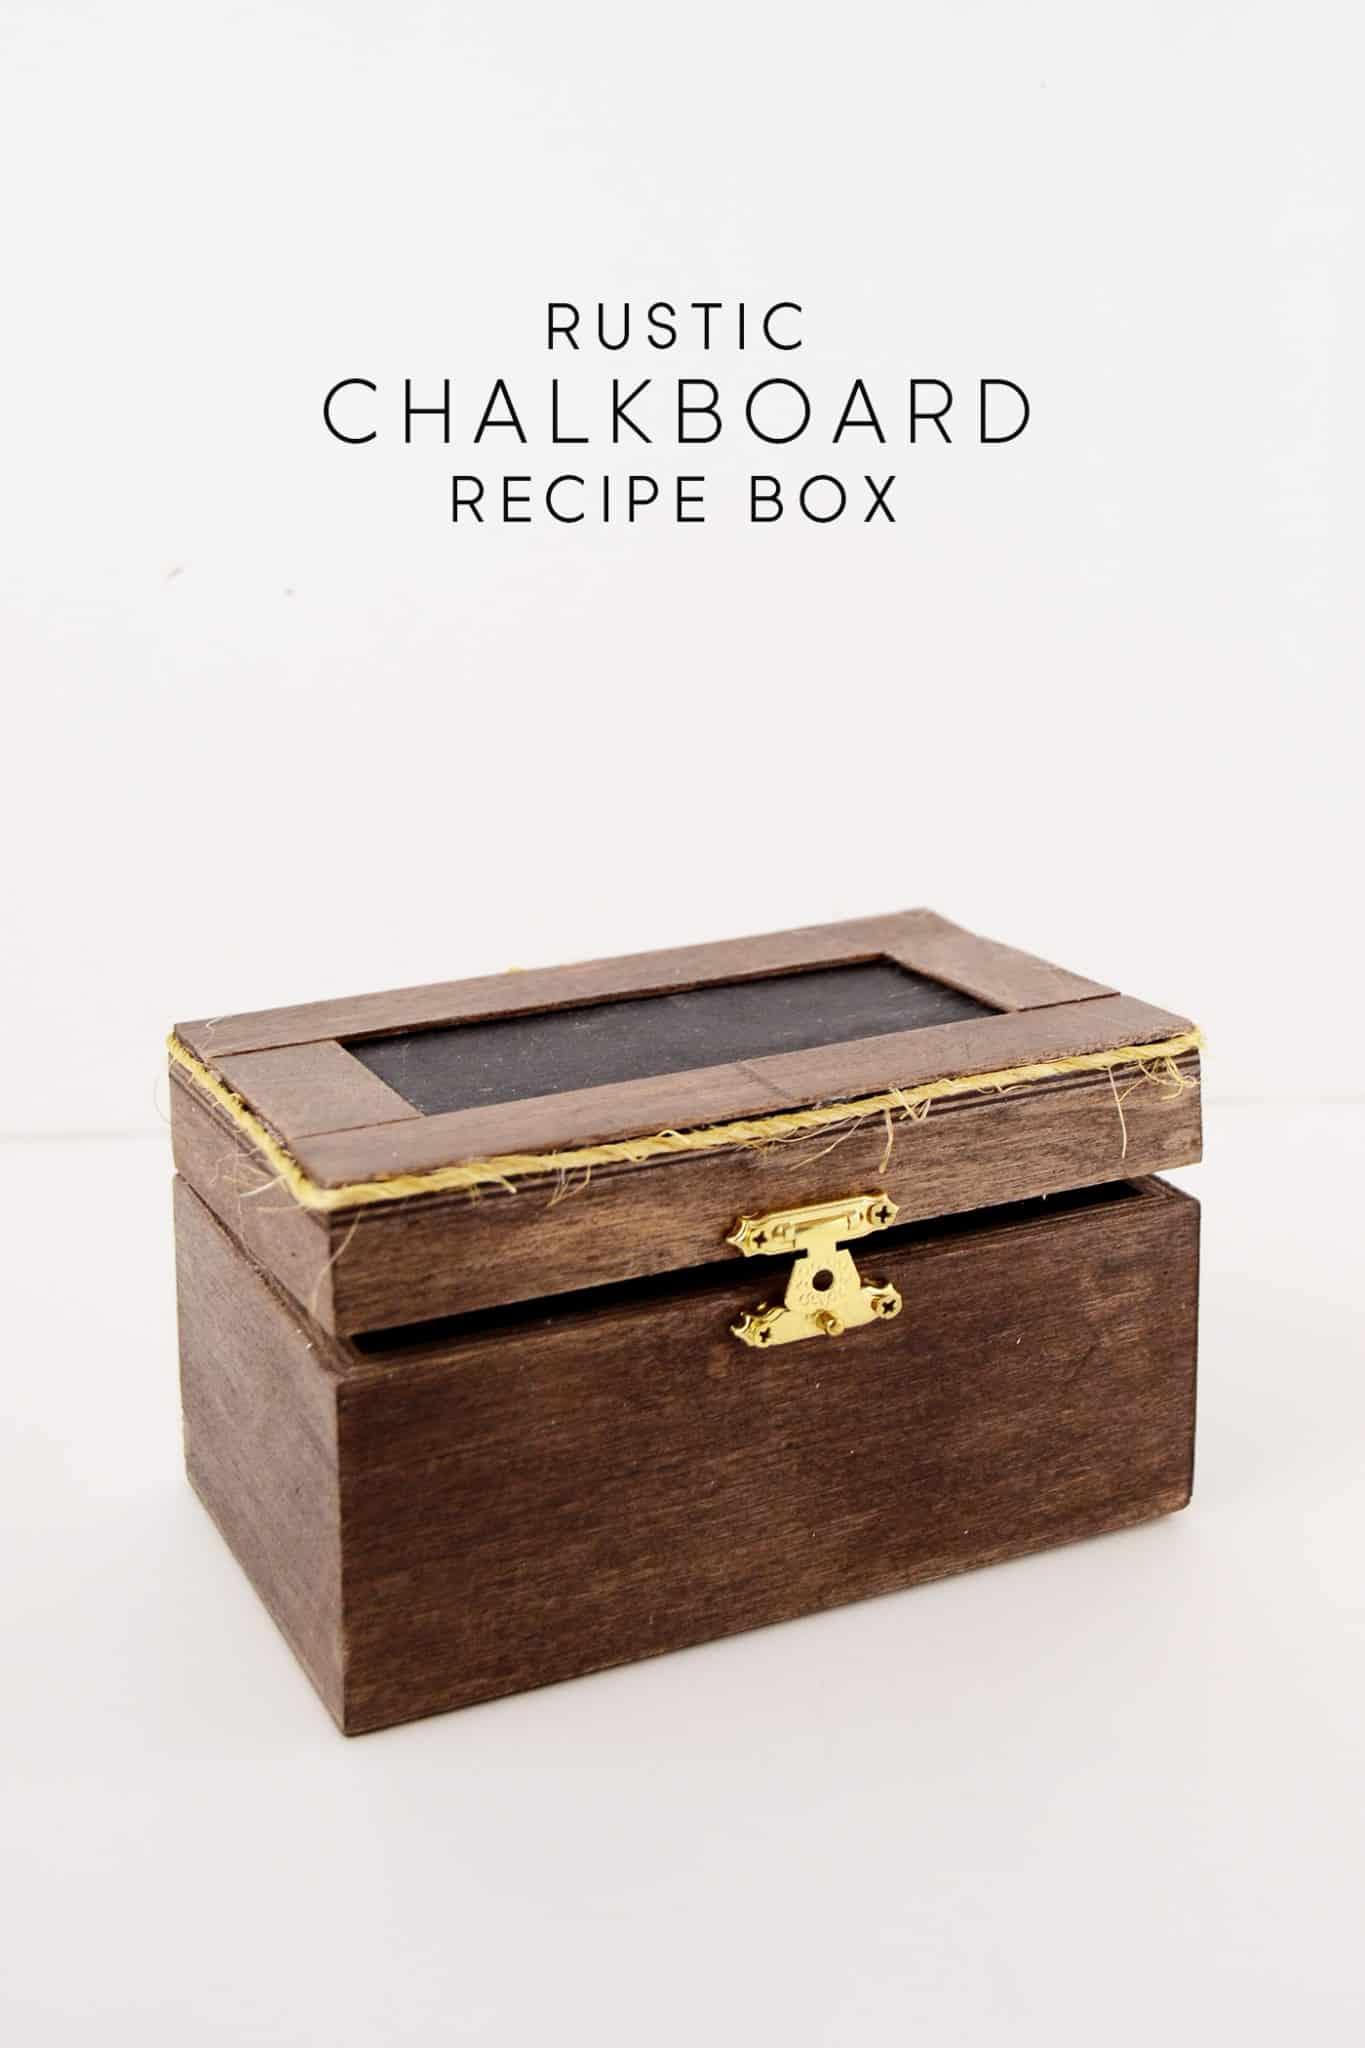 Rustic DY Chalkboard Recipe Boxdiycandy.com